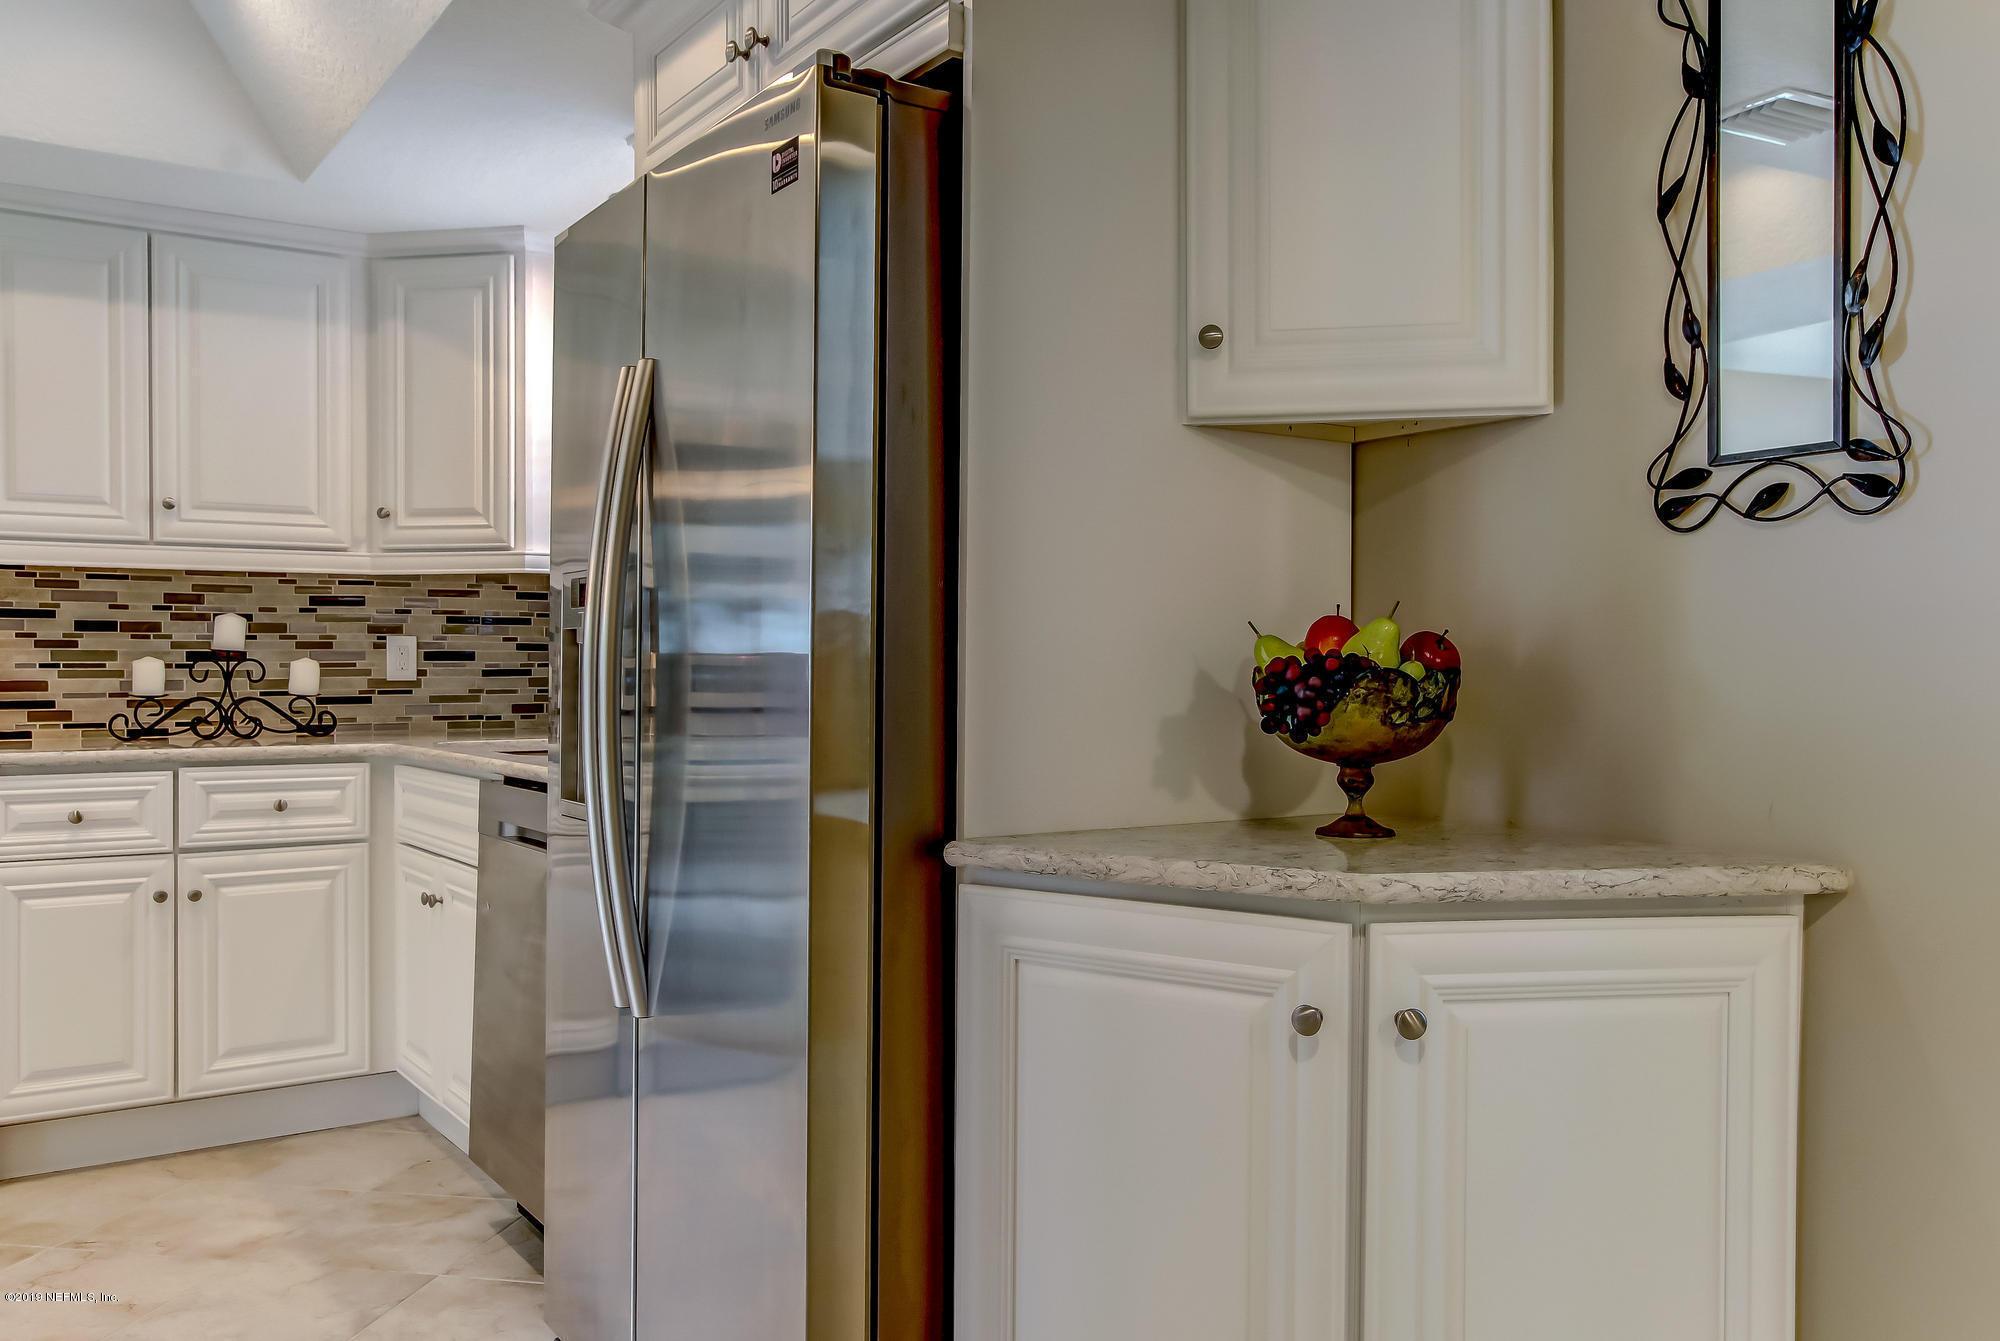 10135 LEISURE- JACKSONVILLE- FLORIDA 32256, 2 Bedrooms Bedrooms, ,2 BathroomsBathrooms,Condo,For sale,LEISURE,999522